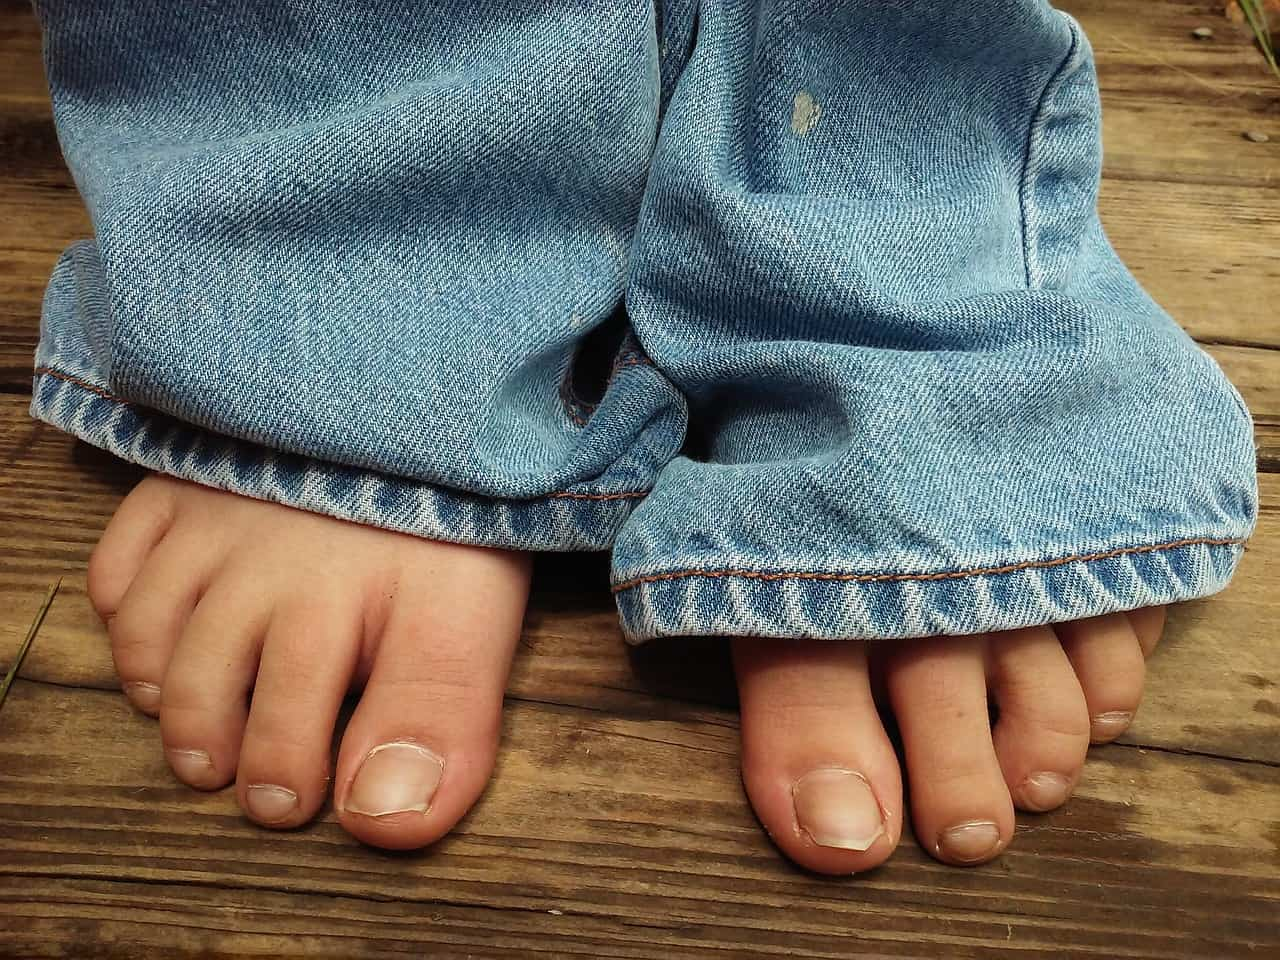 Feet 2286137 1280